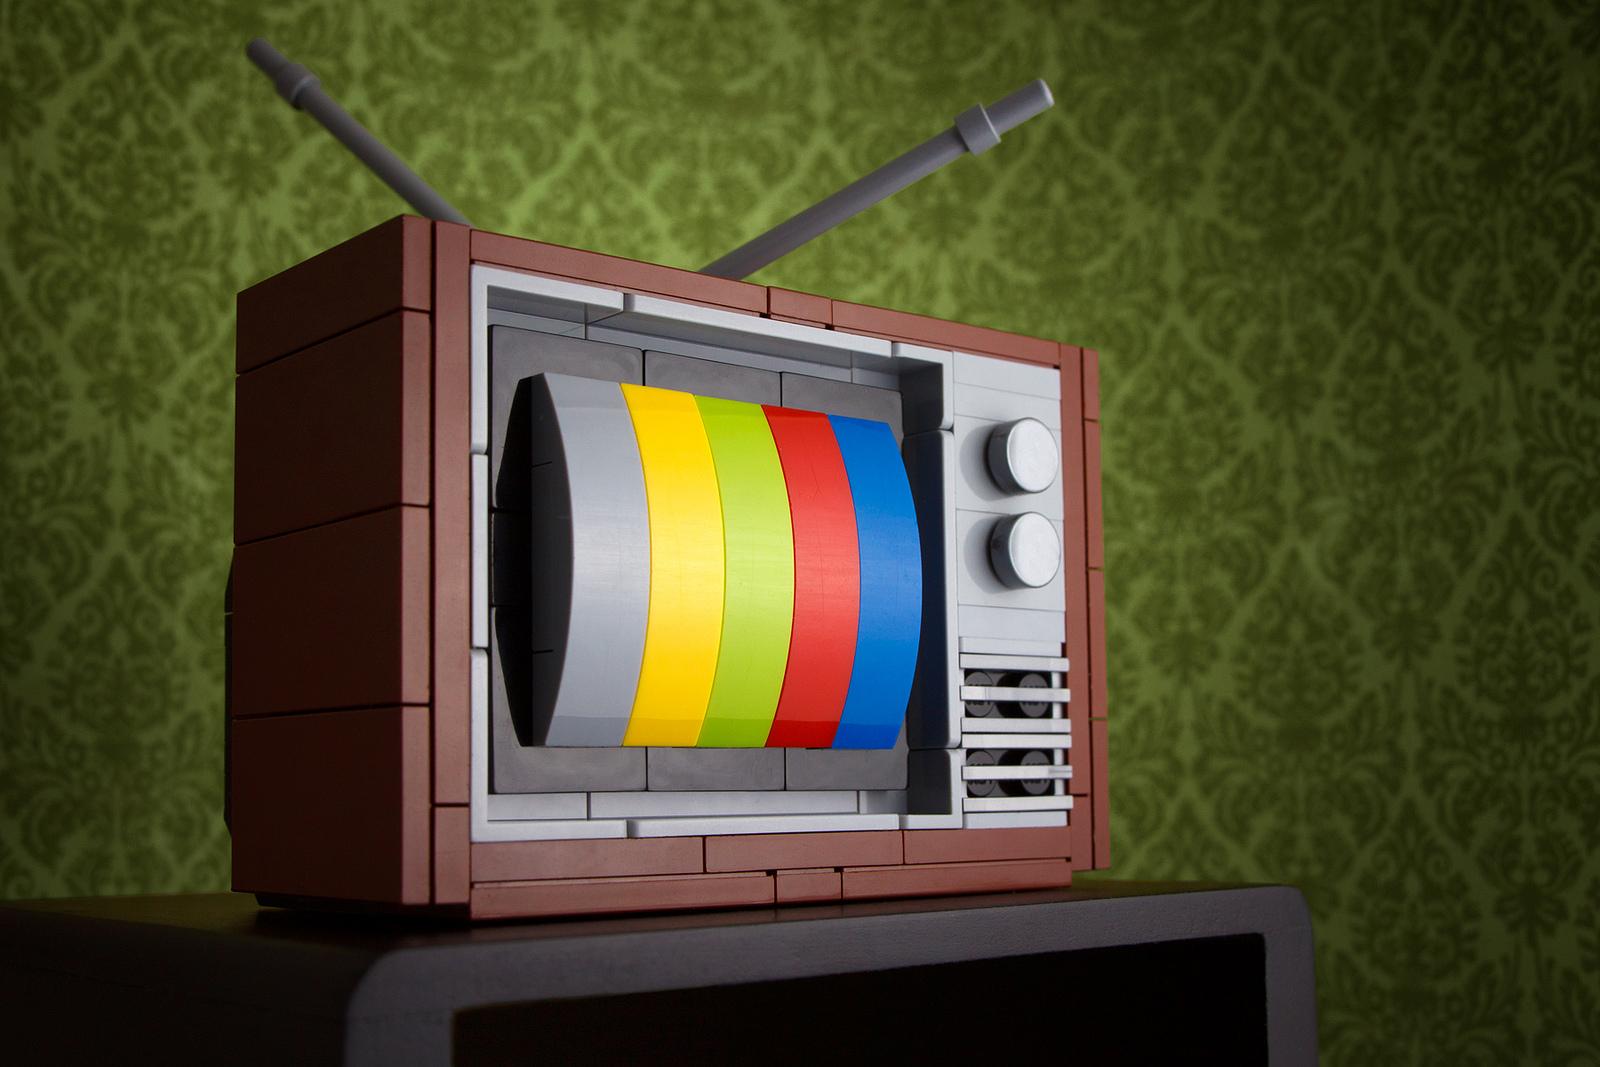 Retro Technology LEGO Kits by Chris McVeigh toys Lego